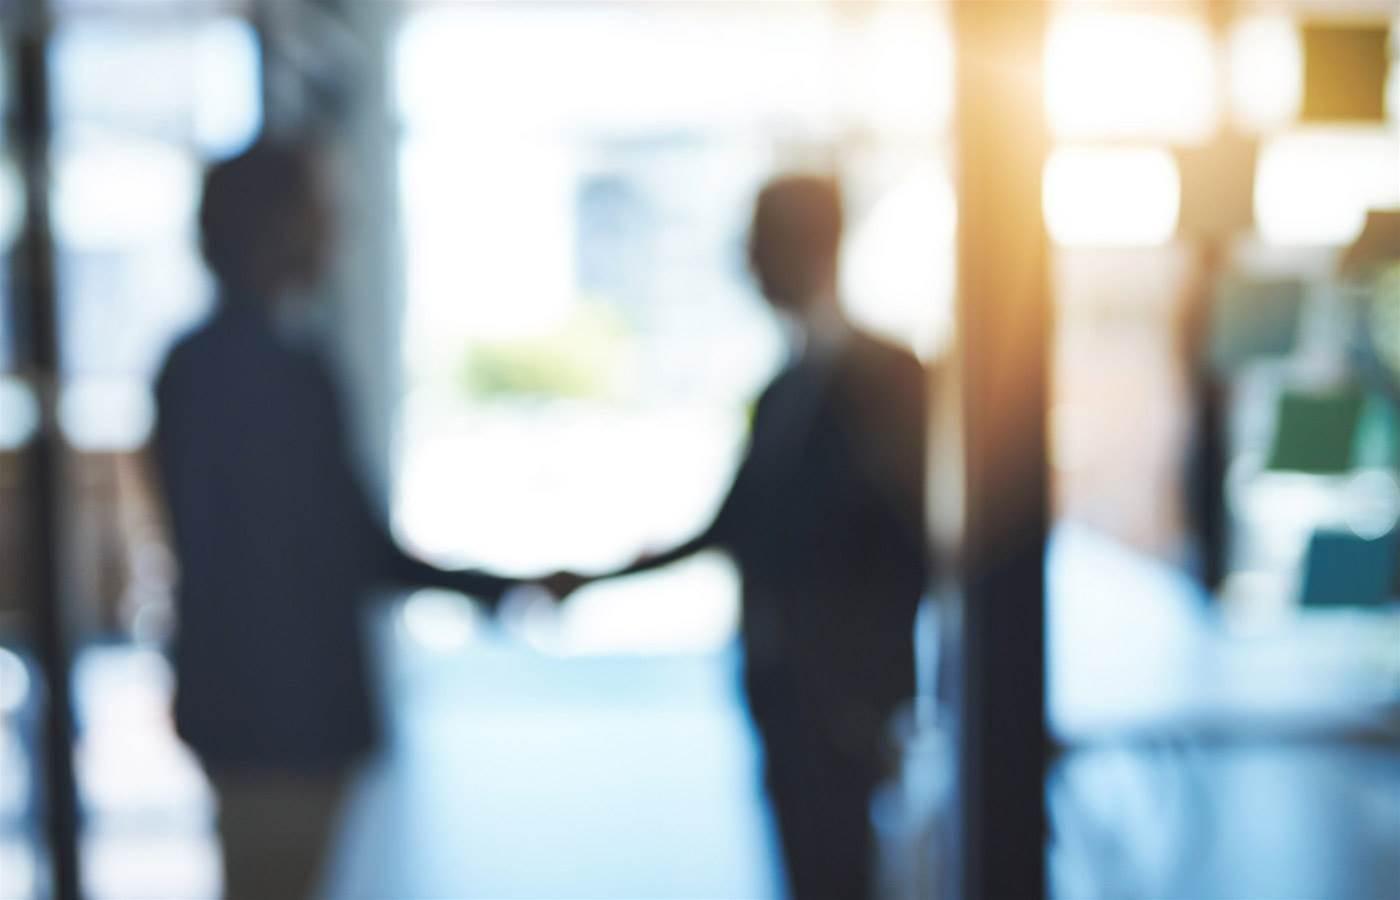 Cisco acquires access management vendor Duo Security for US$2.35 billion